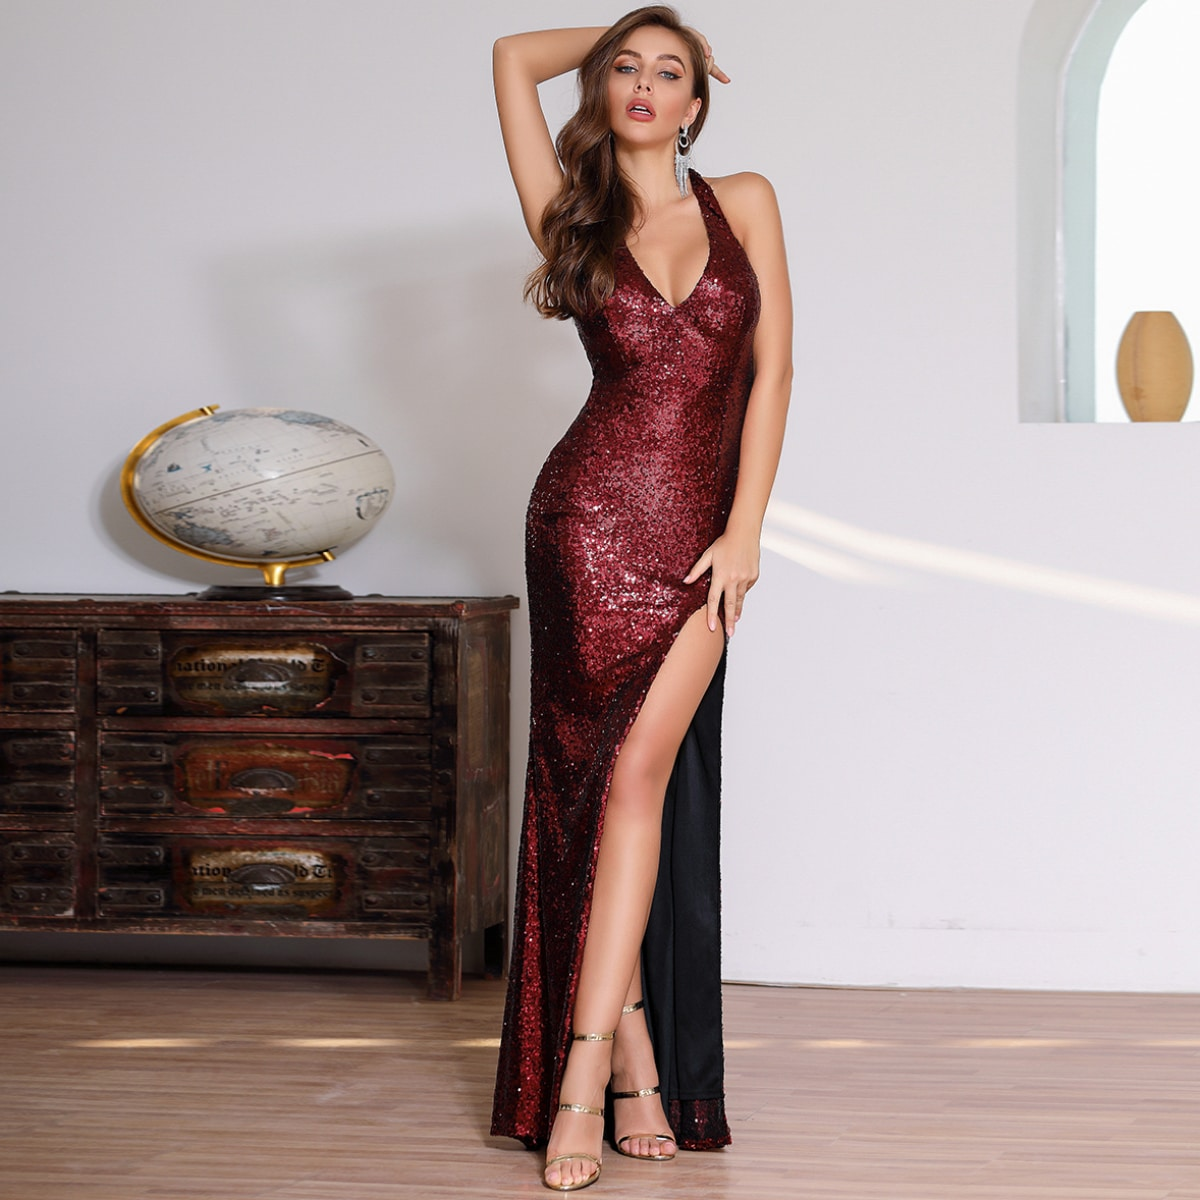 DKRX Halter Backless Split Thigh Sequin Dress